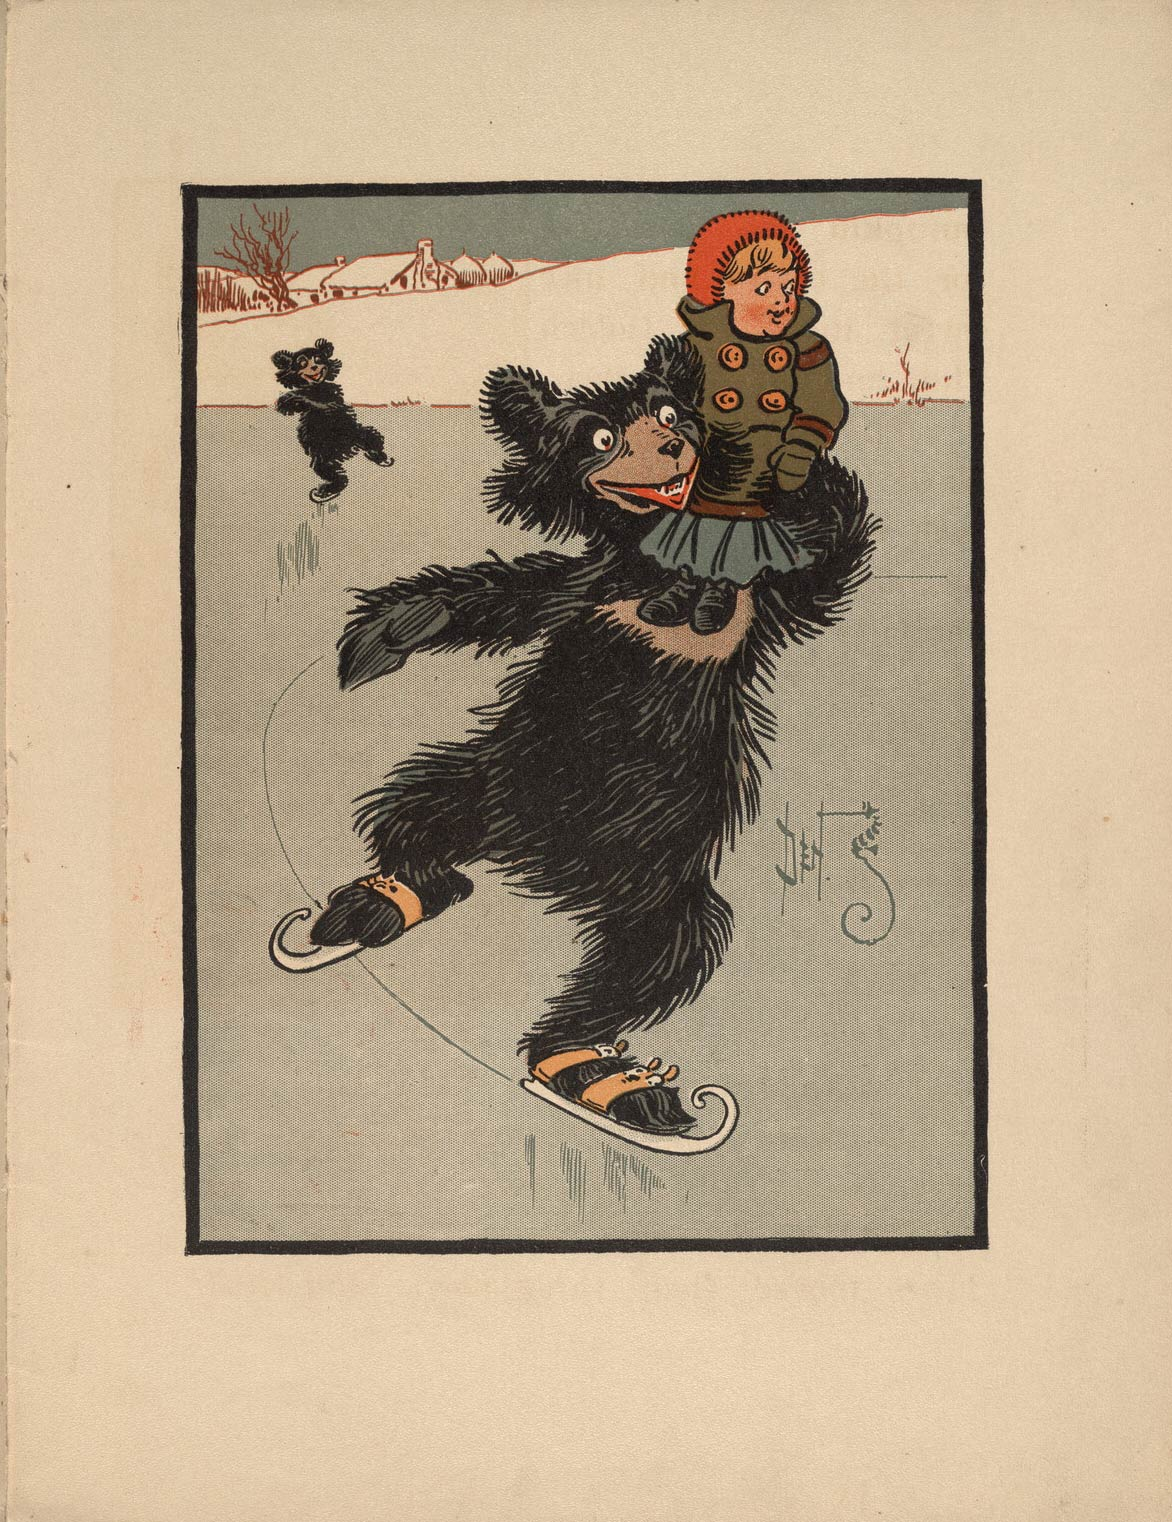 Denslow's Three Bears, 1901